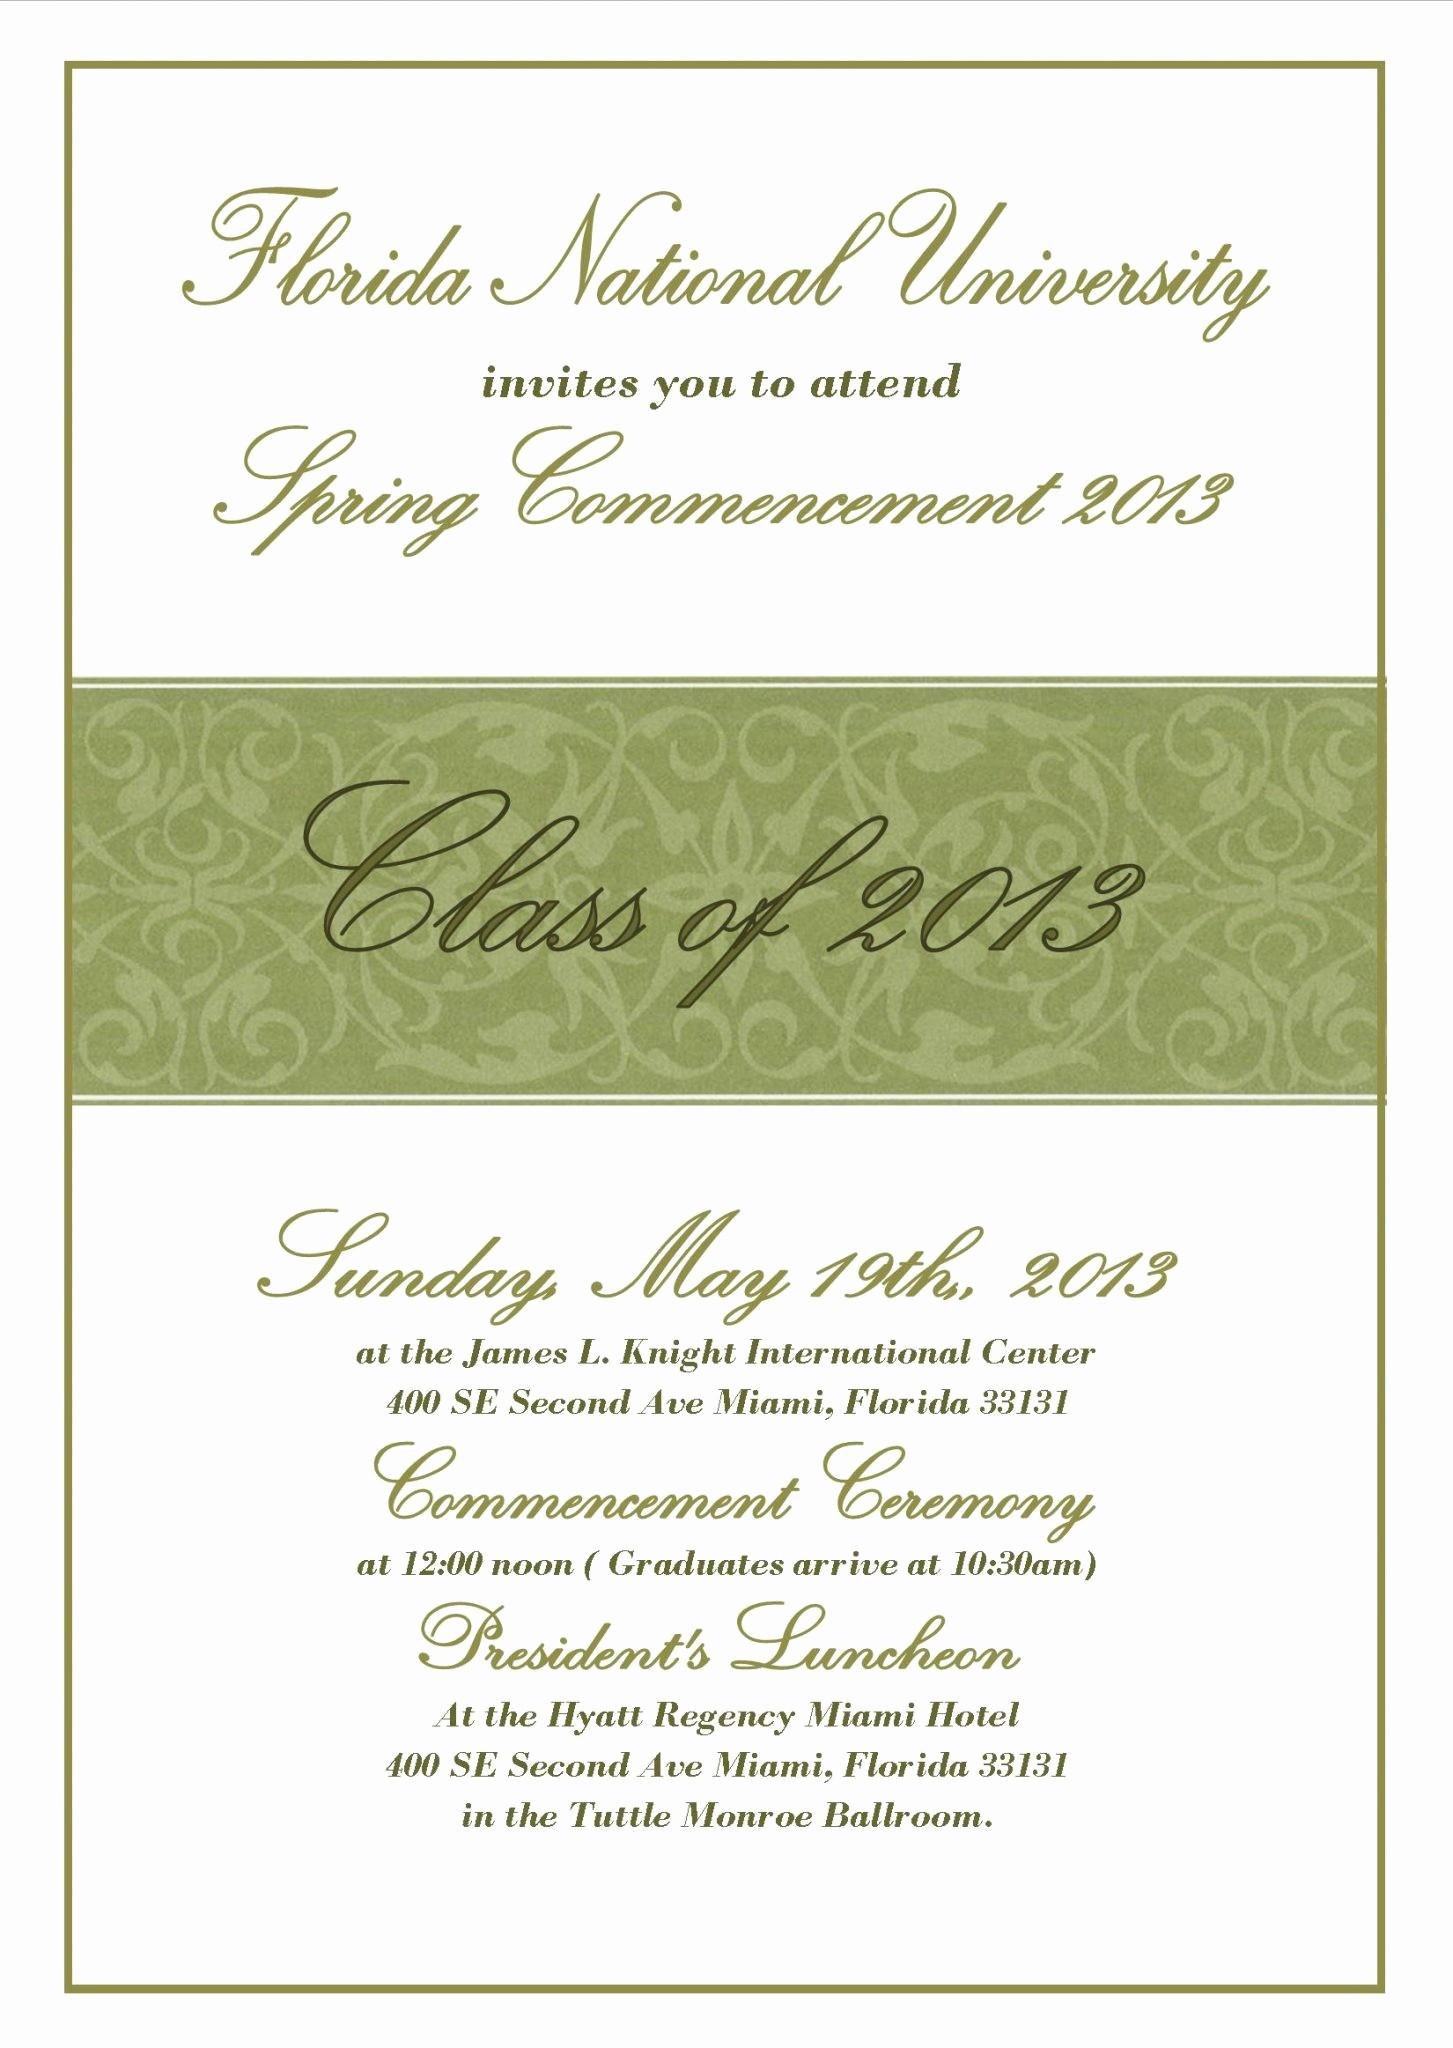 Free Graduation Party Invitation Templates Awesome Free Templates for Graduation Party Invites Editable Free